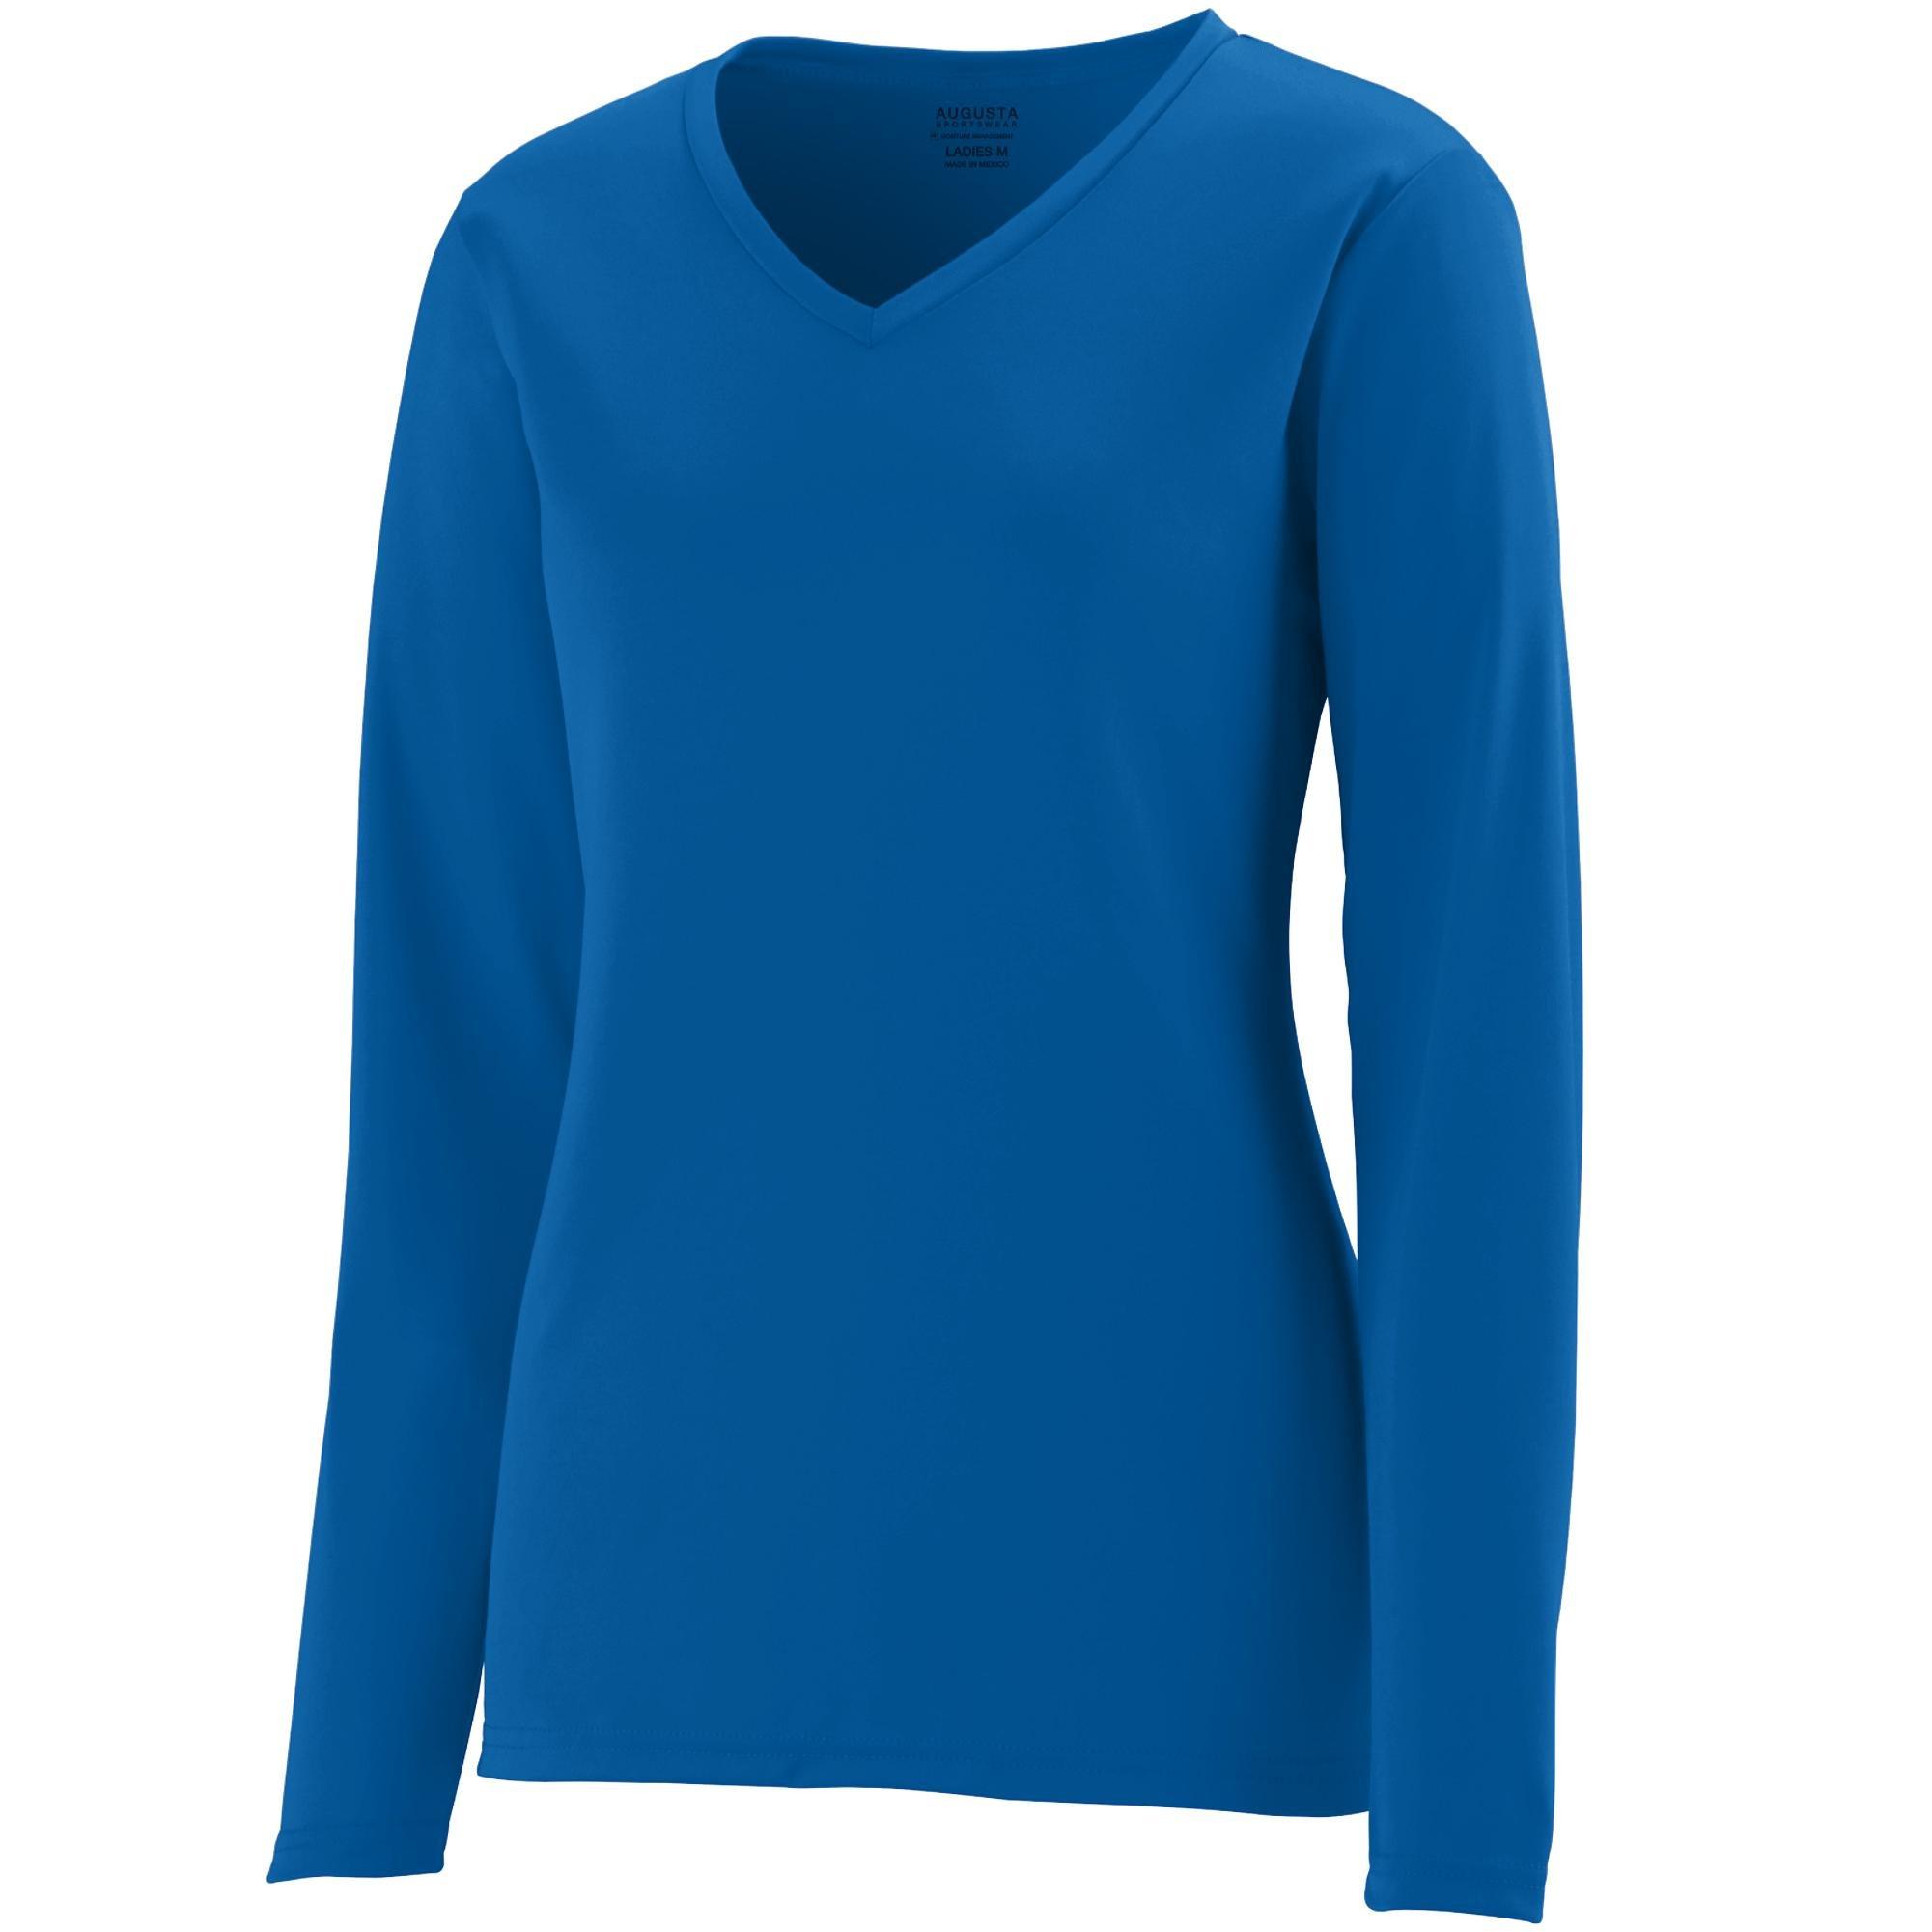 Augusta Sportswear Womens Long Sleeve Wicking T-Shirt, Royal, 3X-Large